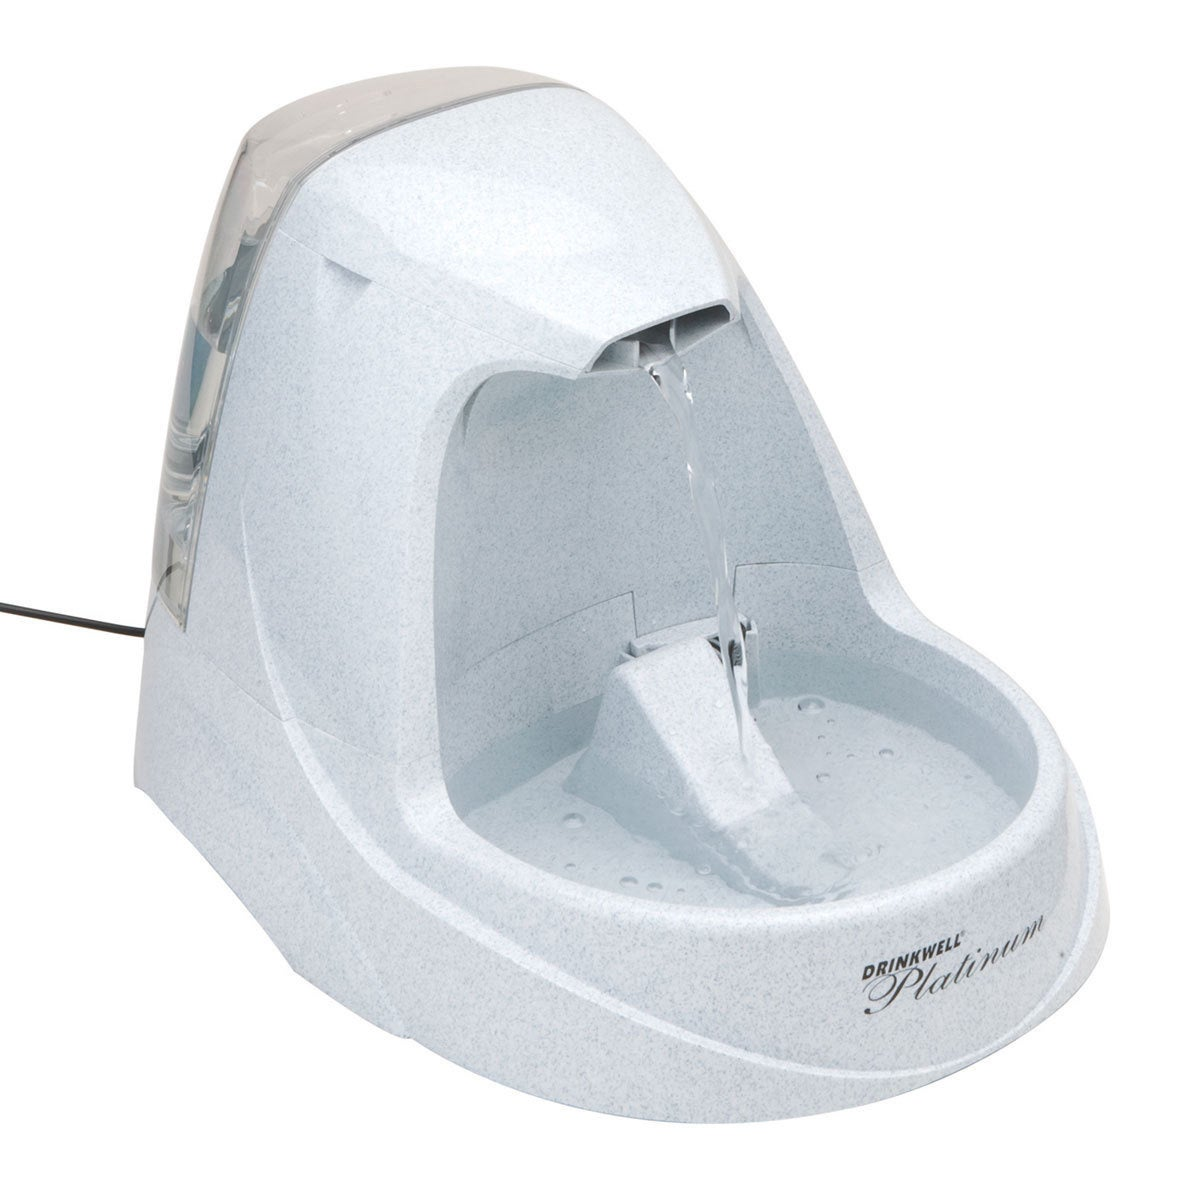 PetSafe Drinkwell Platinum Pet Filtered Water Fountain (P...